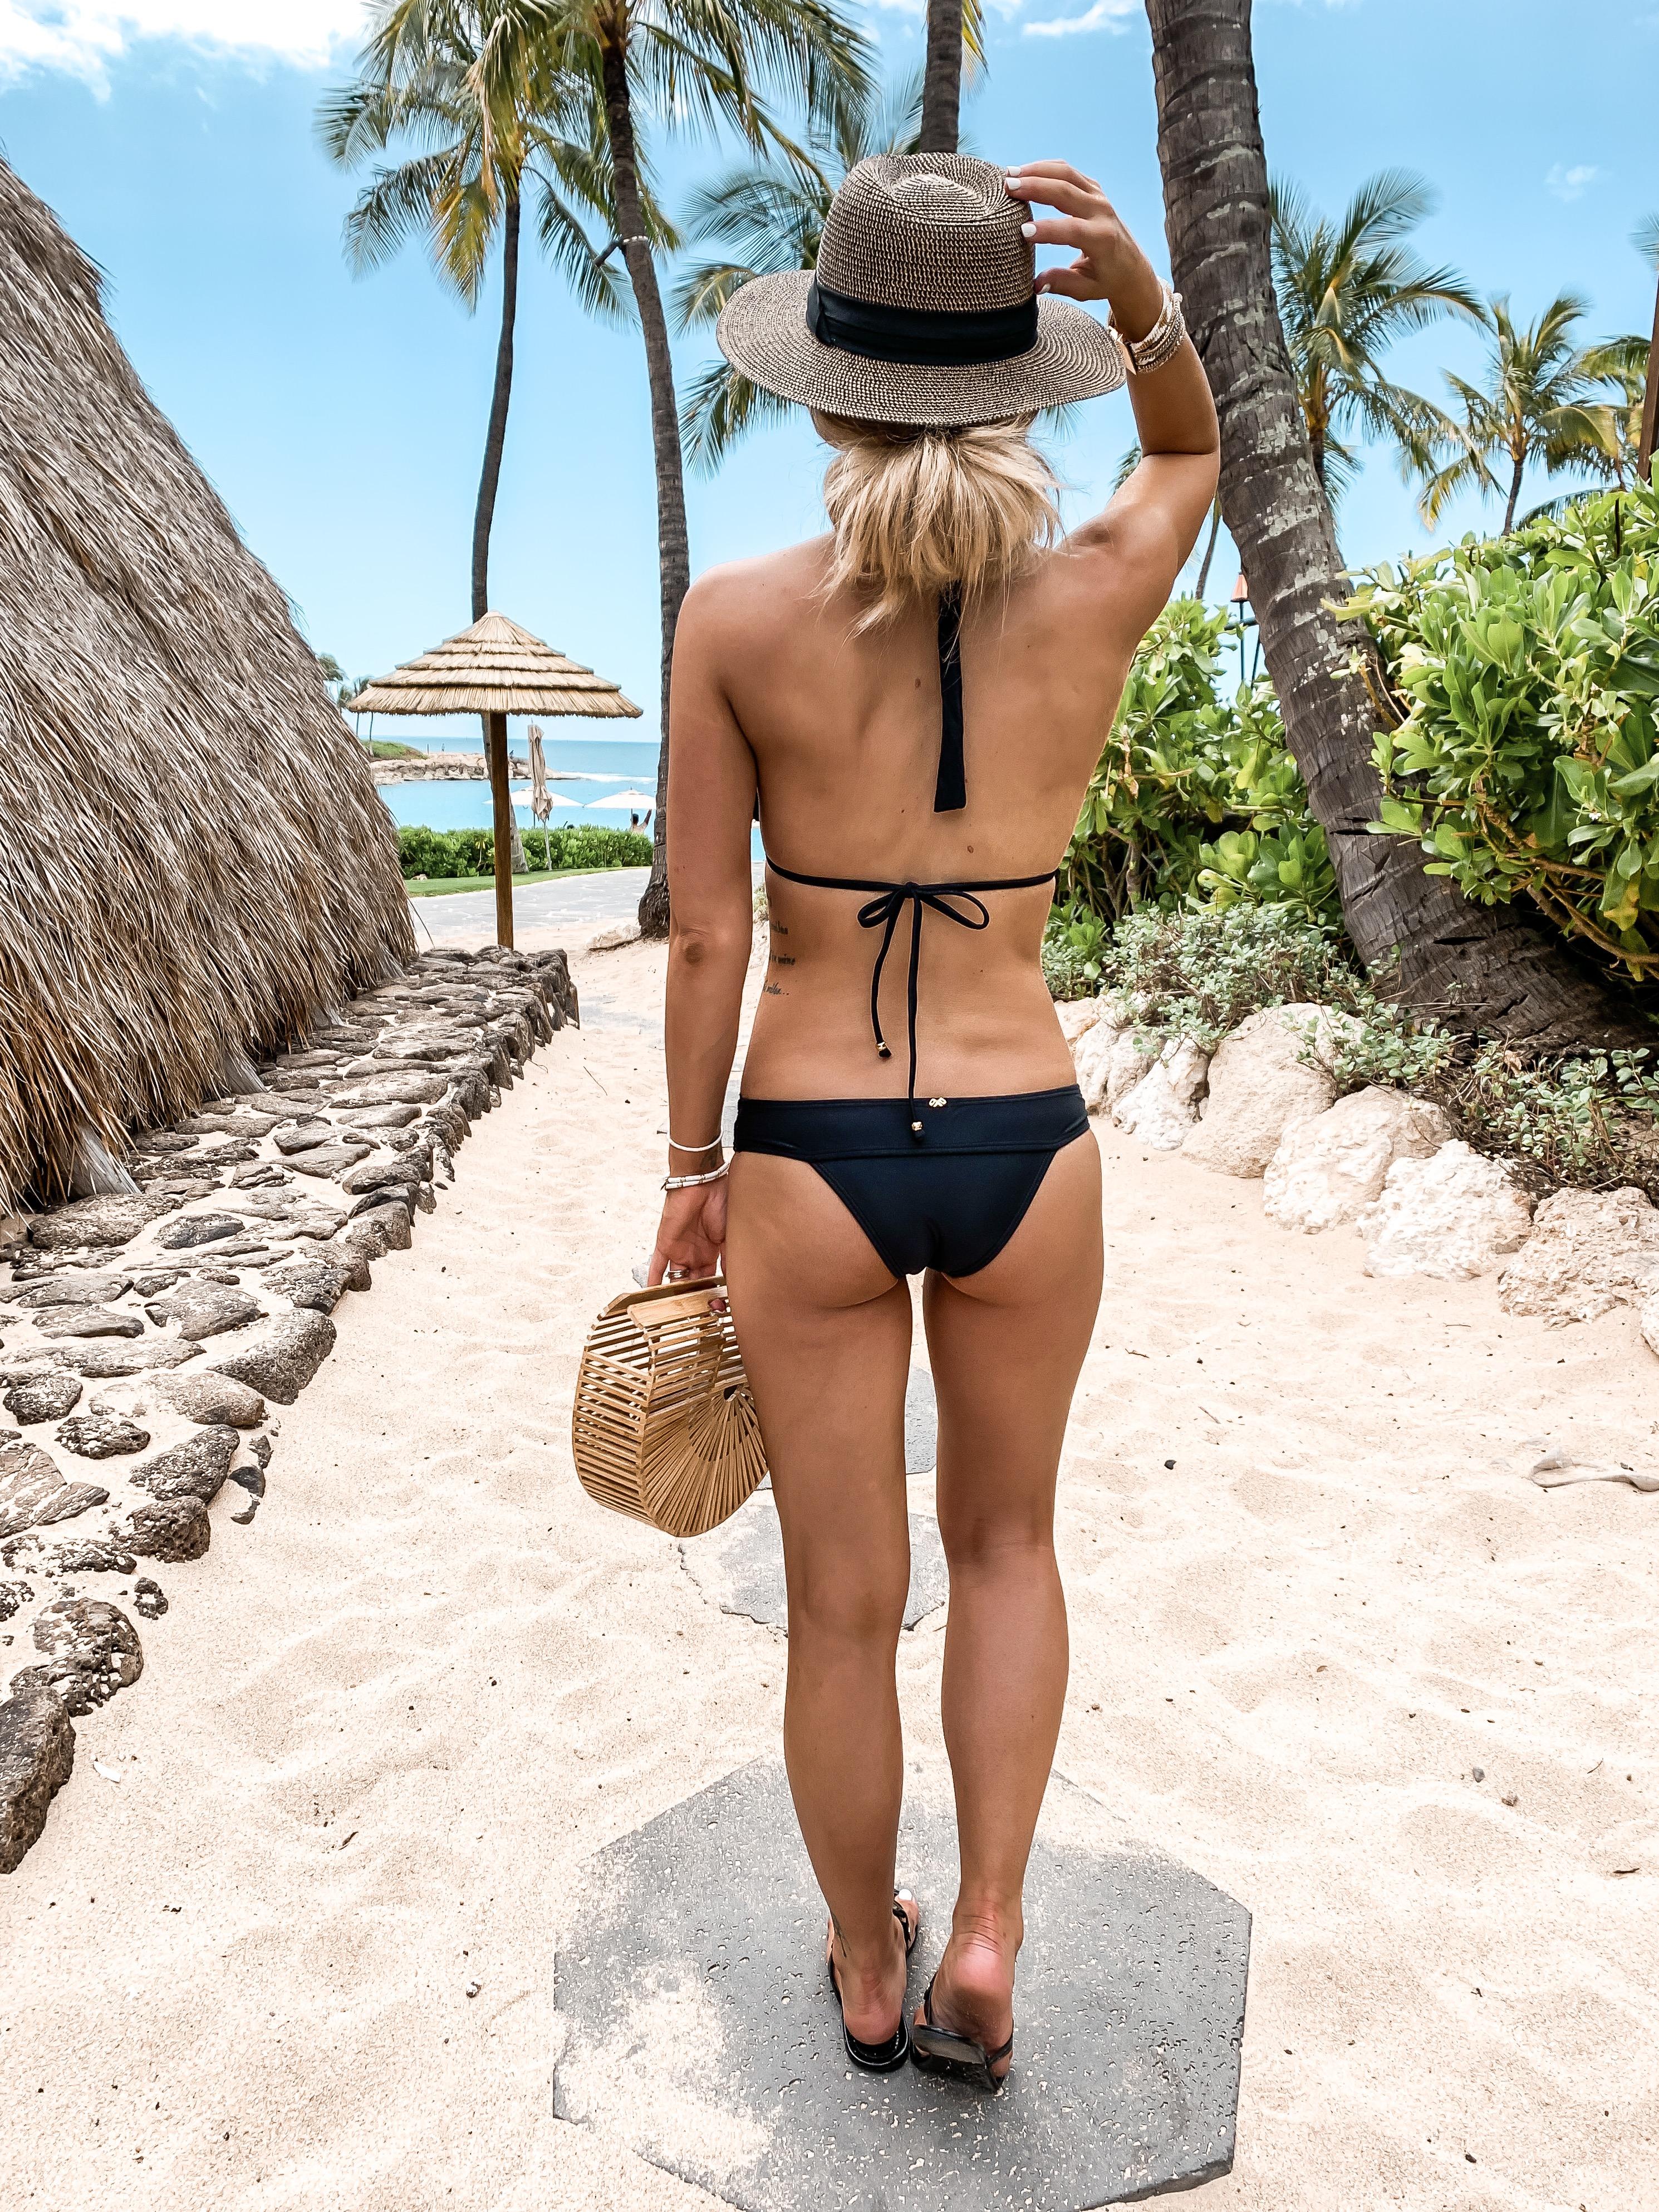 Black lace swimsuit bikini PilyQ Bloomingdales Spring break vacation outfit Four Seasons Oahu Hawaii Laura Beverlin